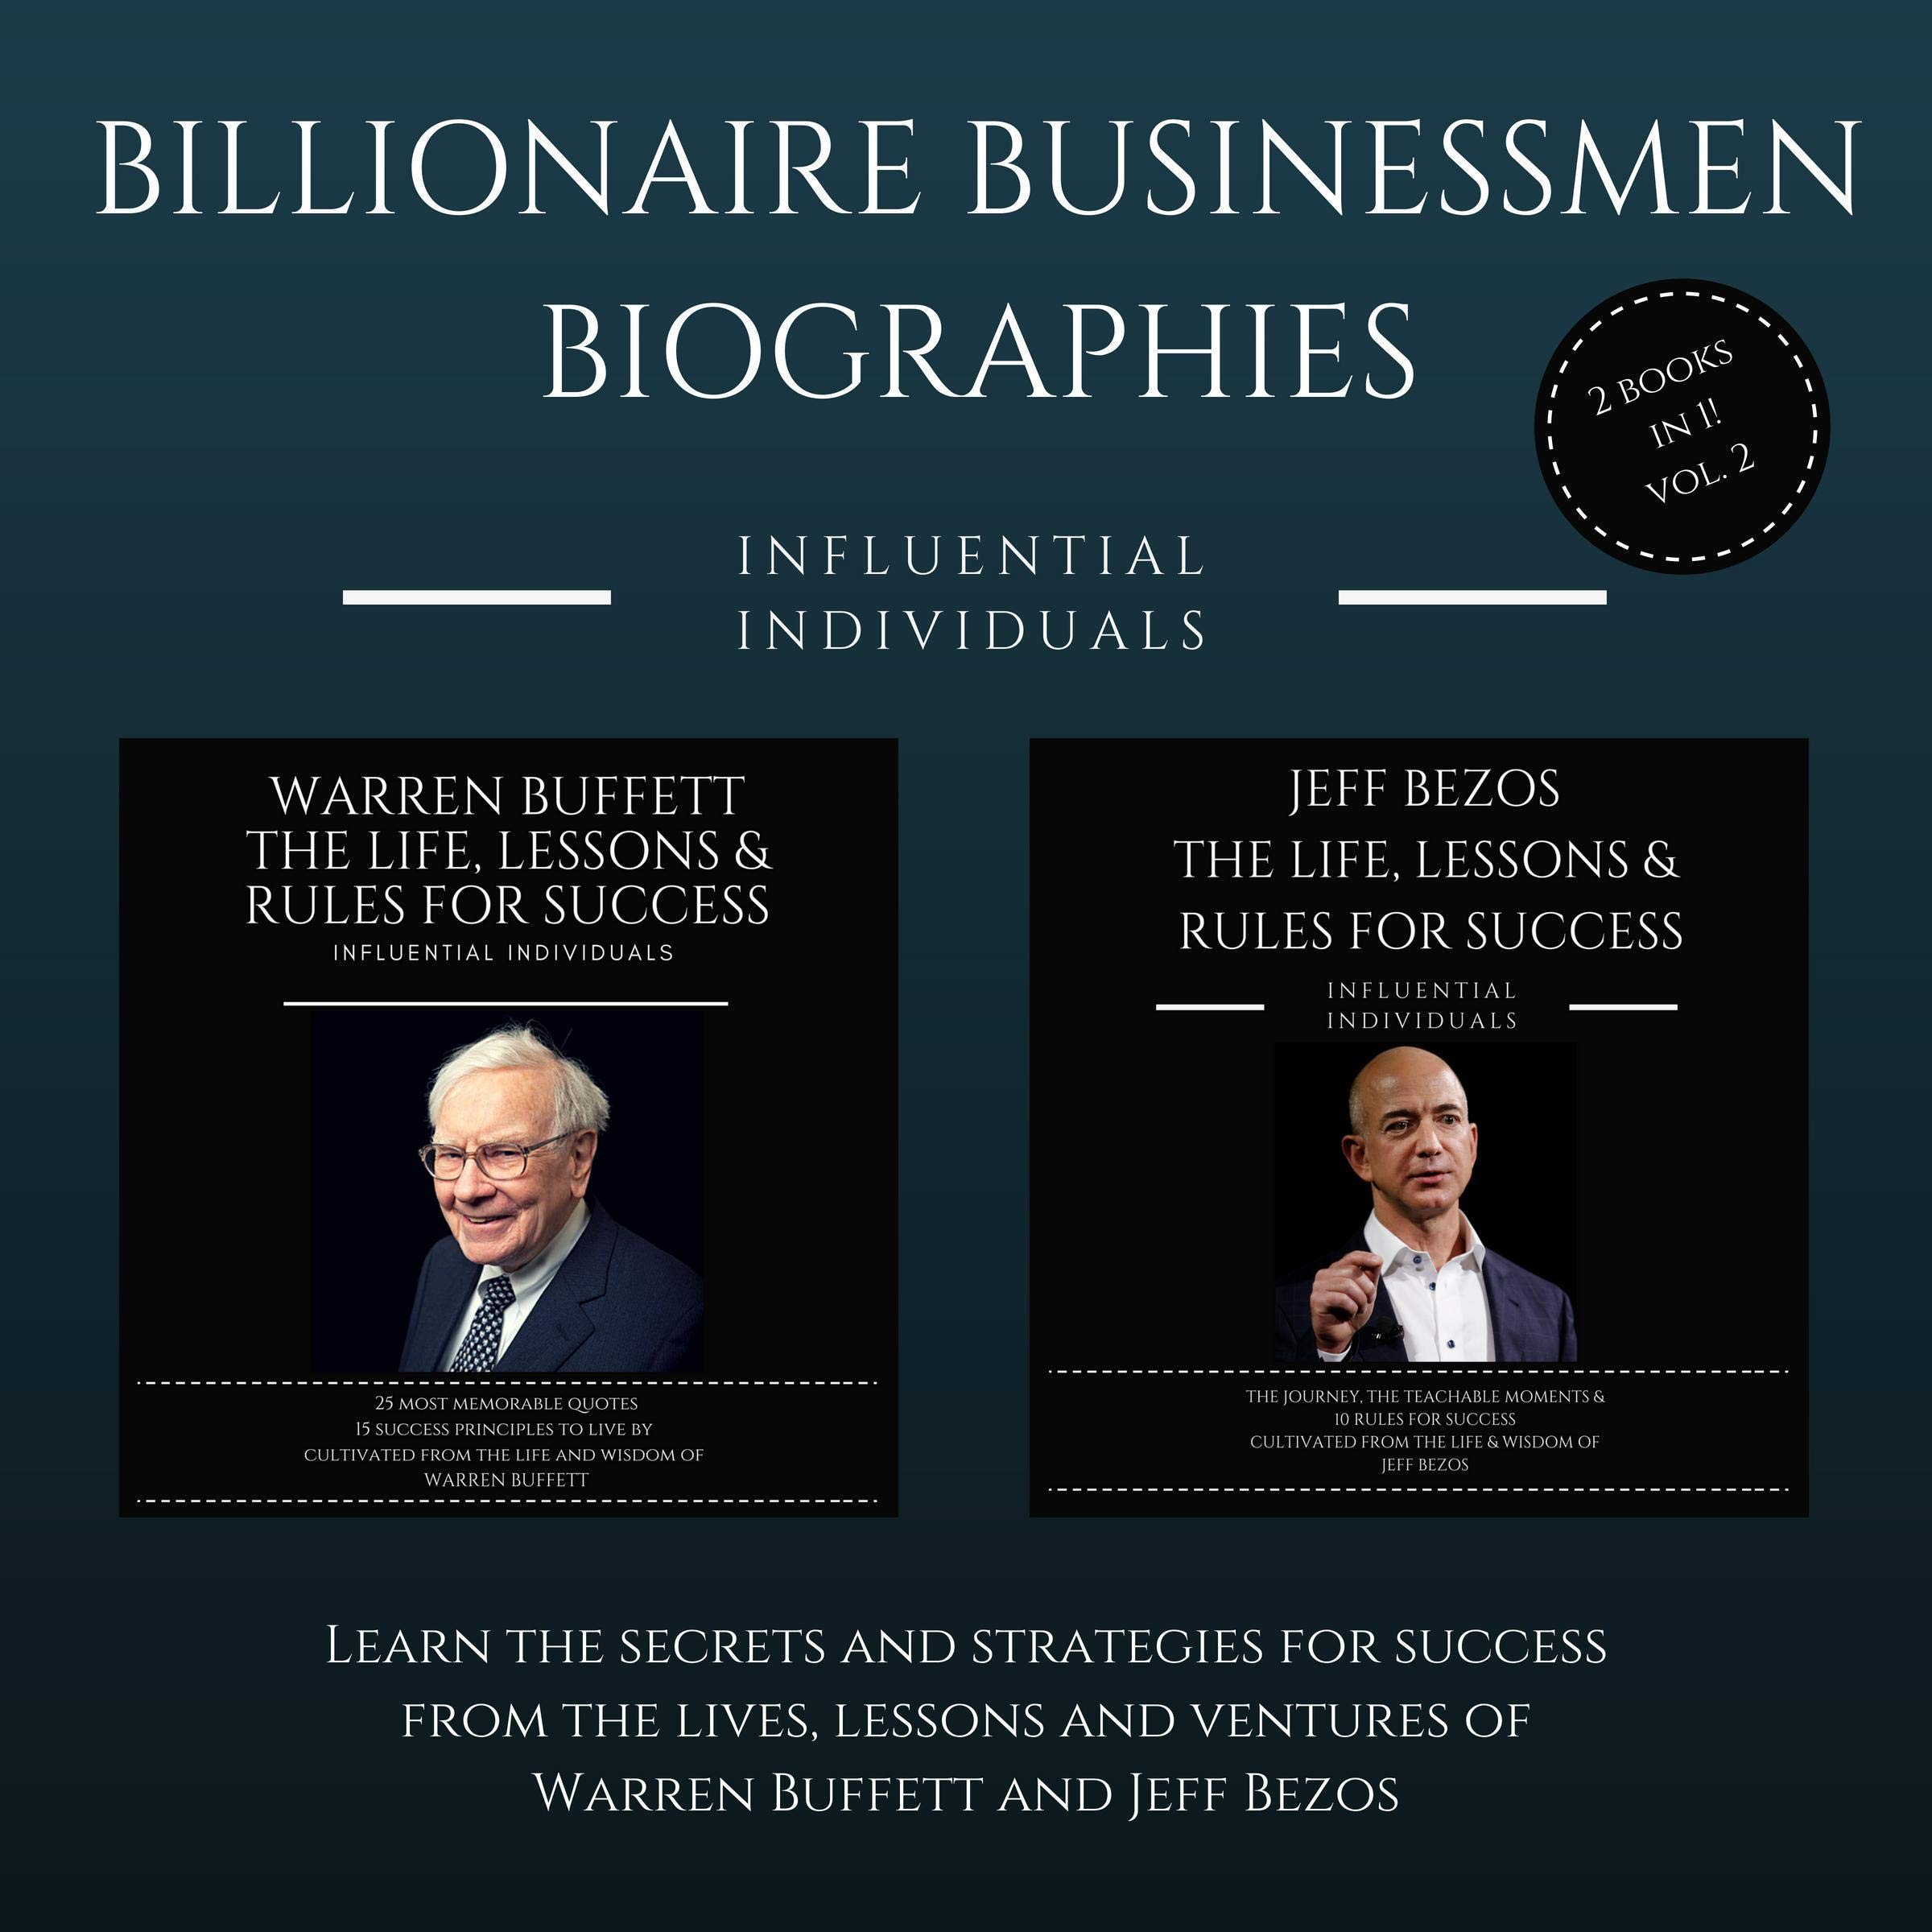 Billionaire Businessmen Biographies: 2 books in 1! (Vol. 2): Warren Buffett: The Life, Lessons & Rules for Success and Jeff Bezos: The Life, Lessons & Rules for Success